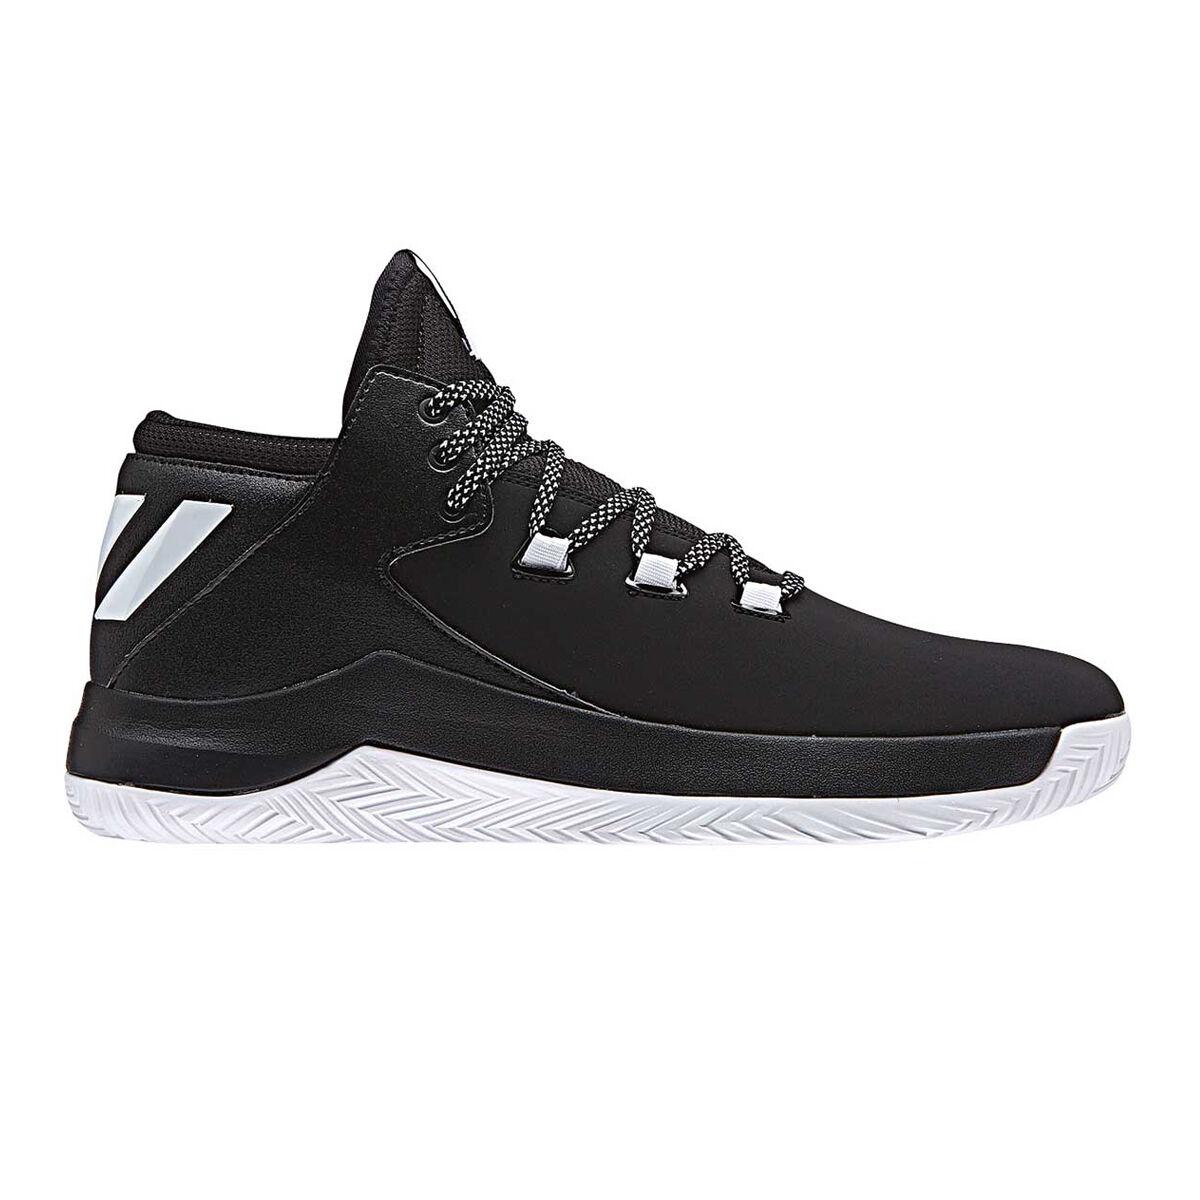 Adidas Men's D Rose Menace 2.0 Black White Basketball Shoes